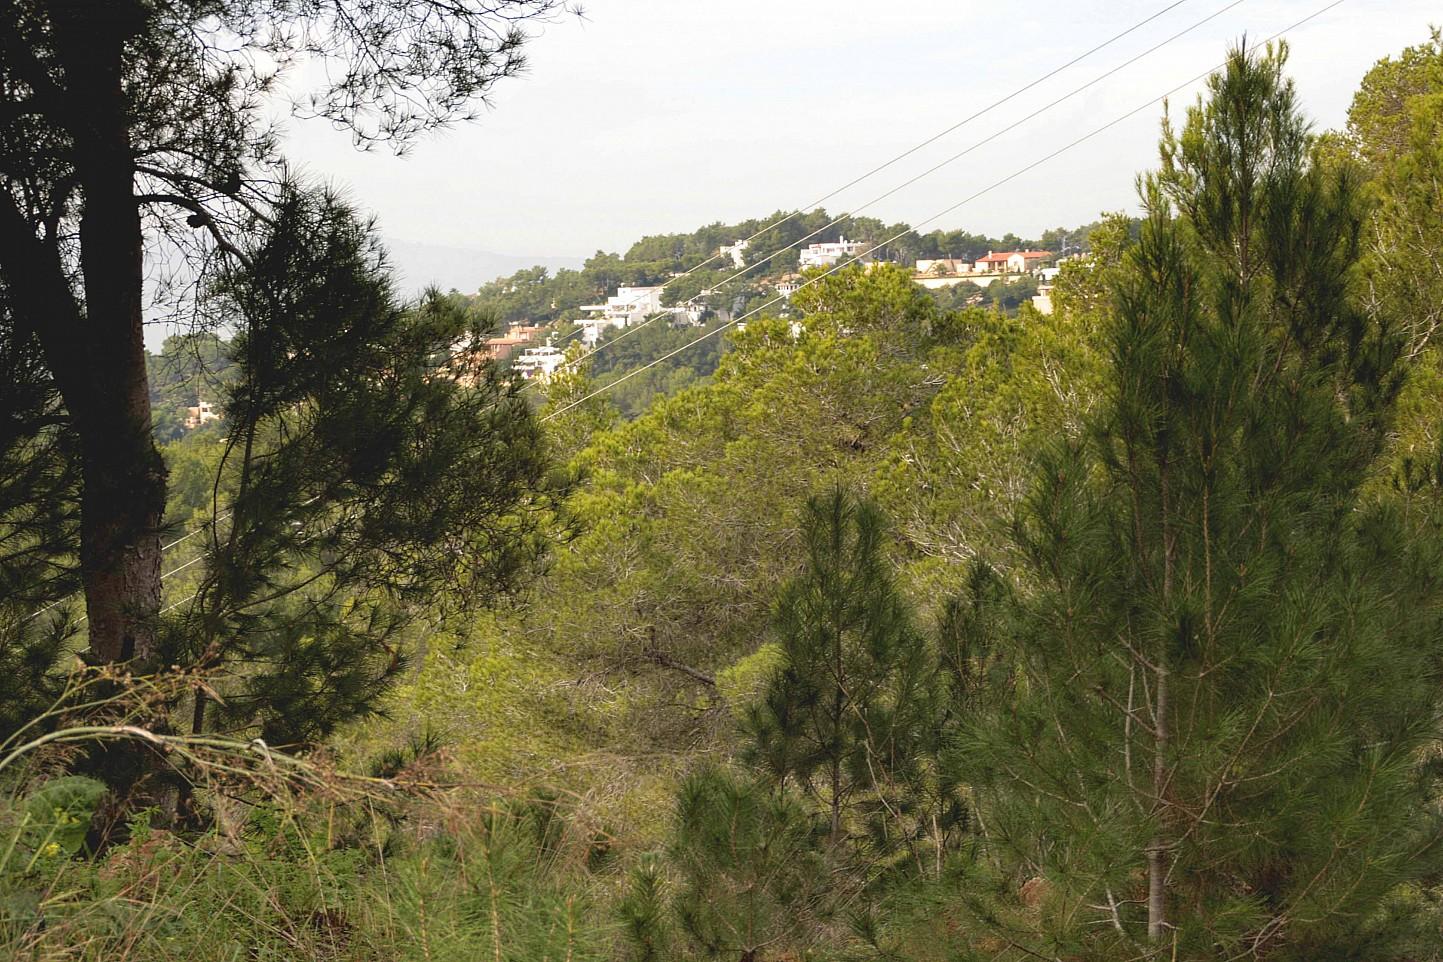 Участок земли на продажу на Ибице